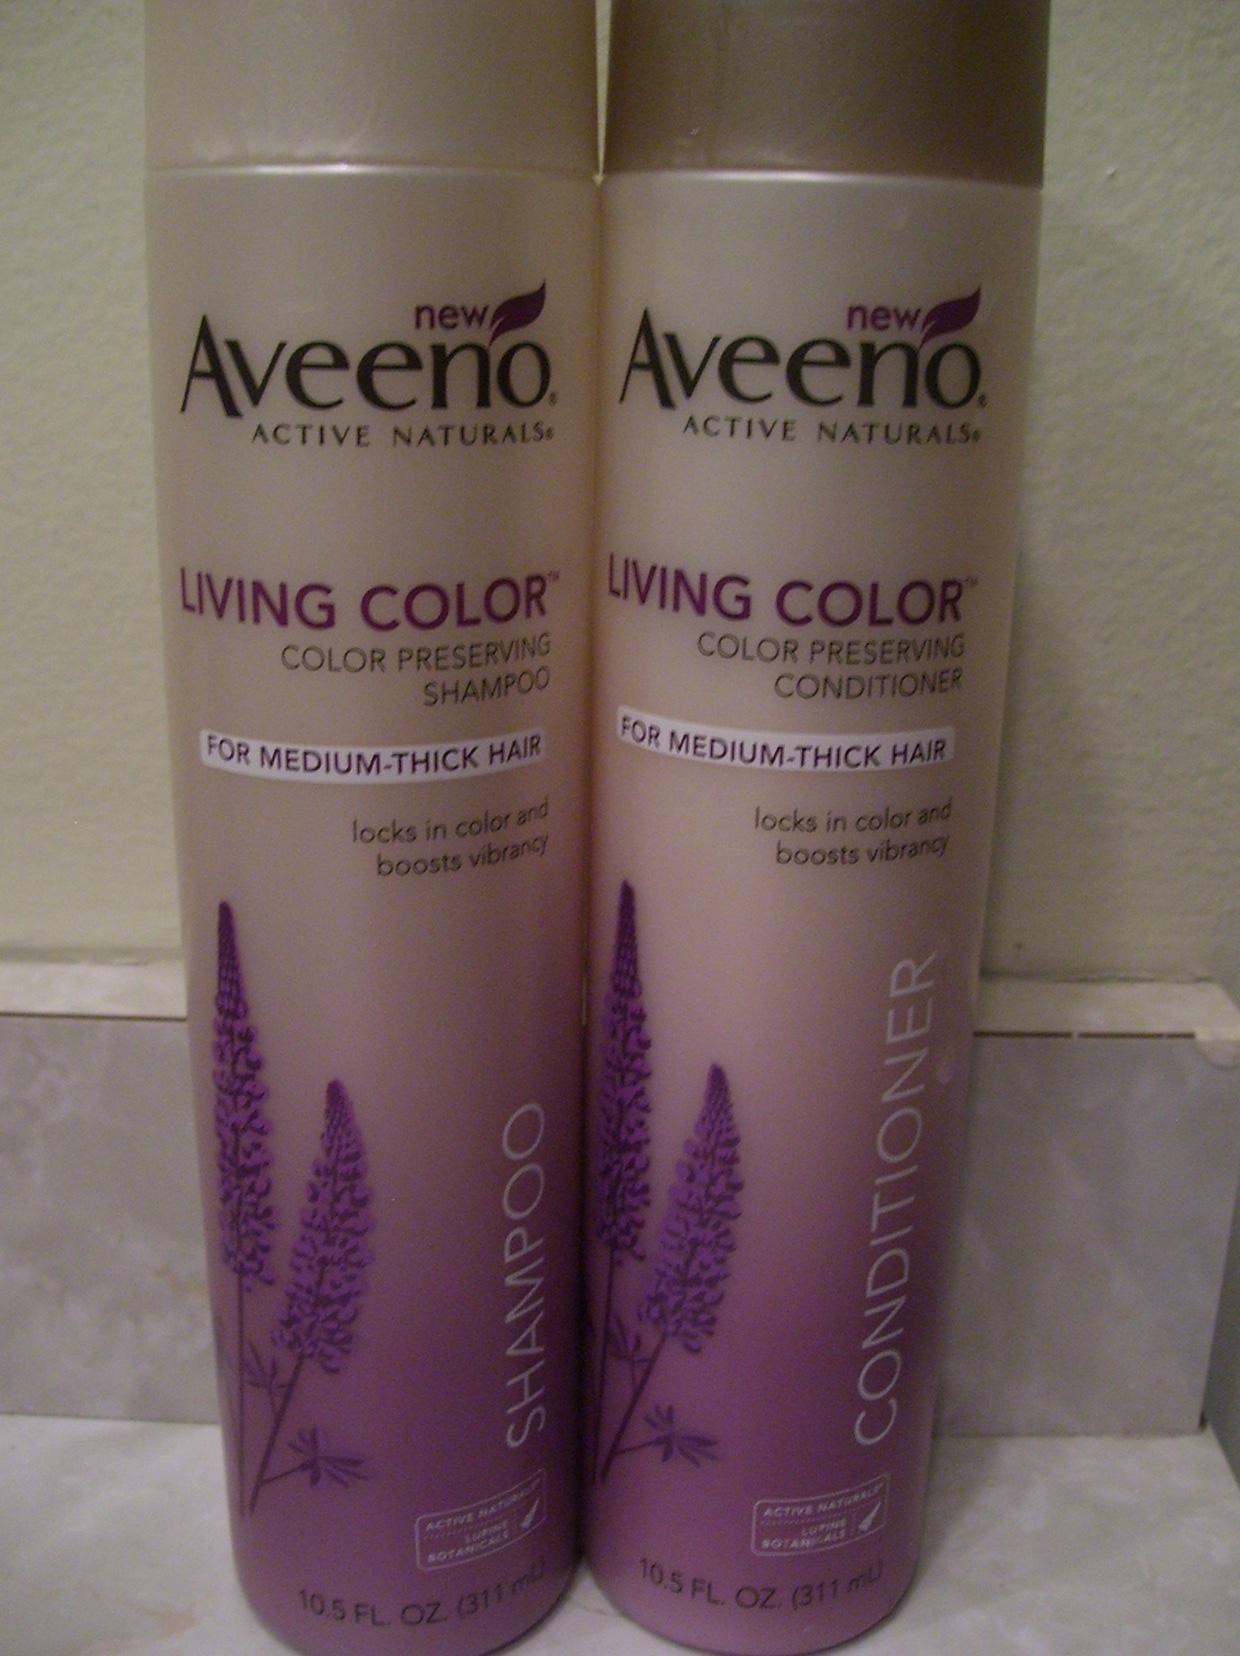 Aveeno Active Naturals Living Color – Color Preserving Shampoo & Conditioner